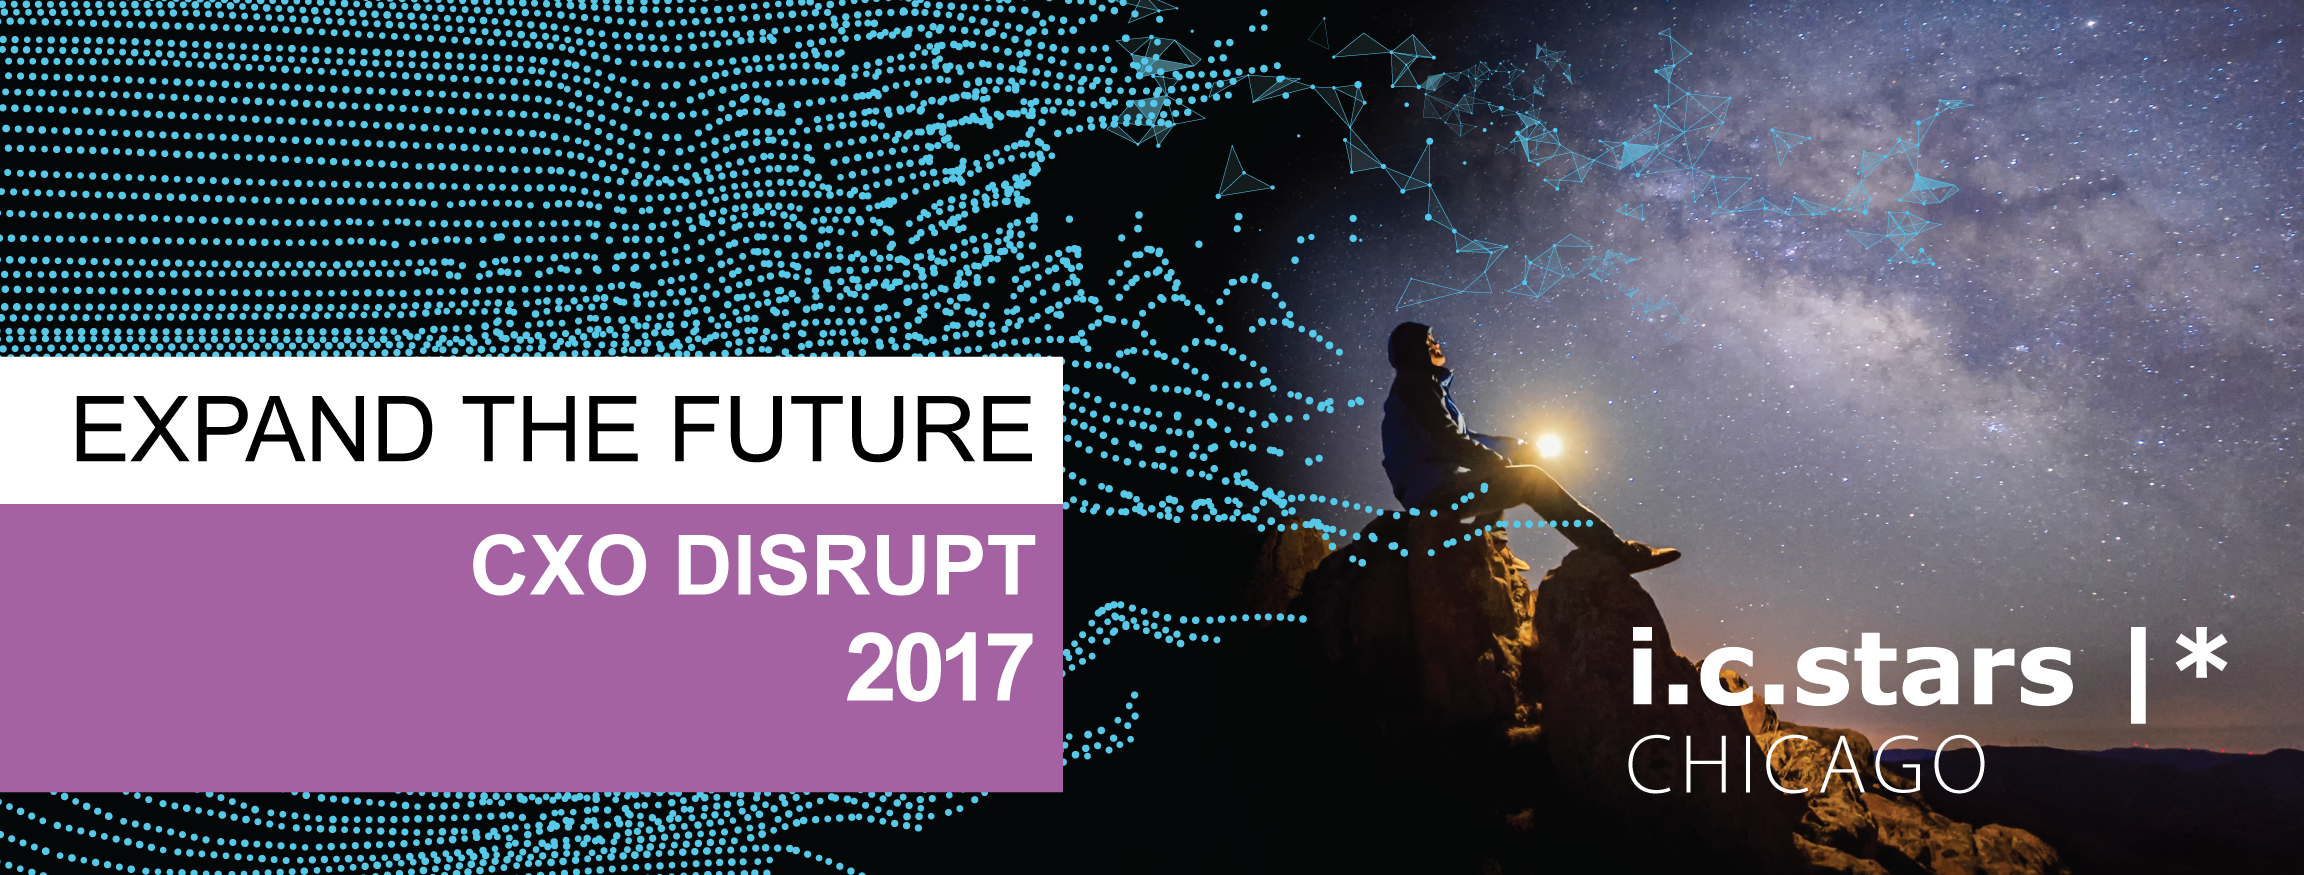 i.c.stars Presents: Expand the Future CXO Disrupt 2017